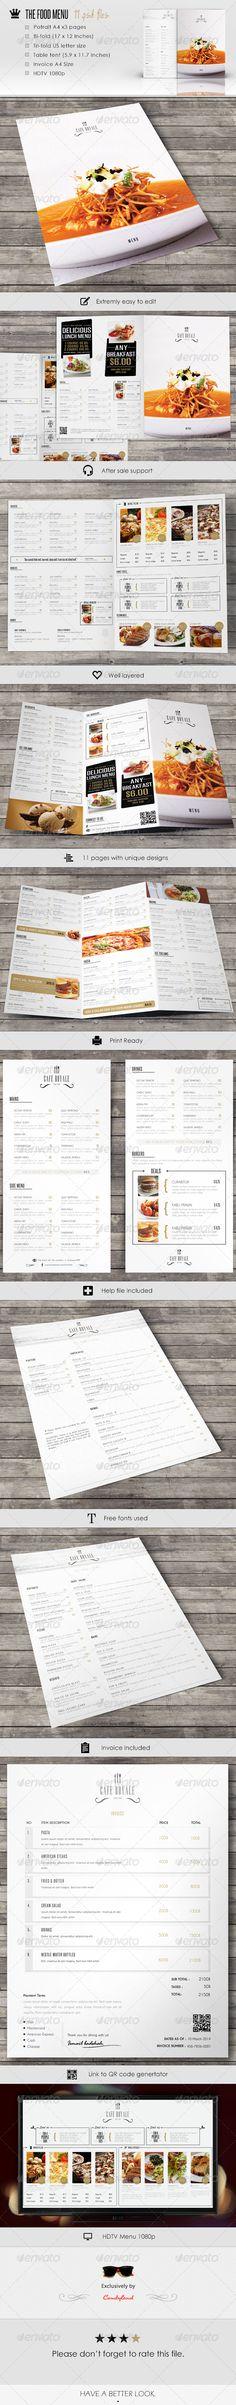 Food Menu Pack Template #design #speisekarte Download: http://graphicriver.net/item/menu-pack-3/7523260?ref=ksioks